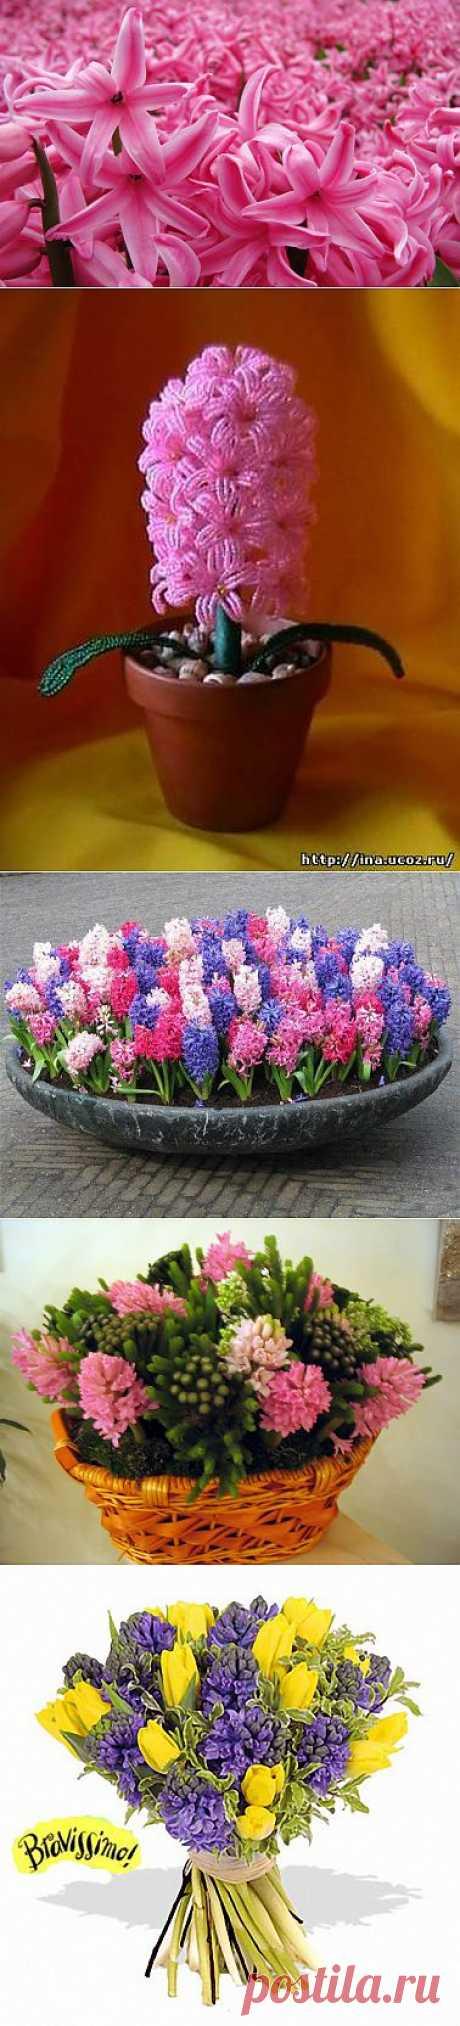 фото цветы гиацинт